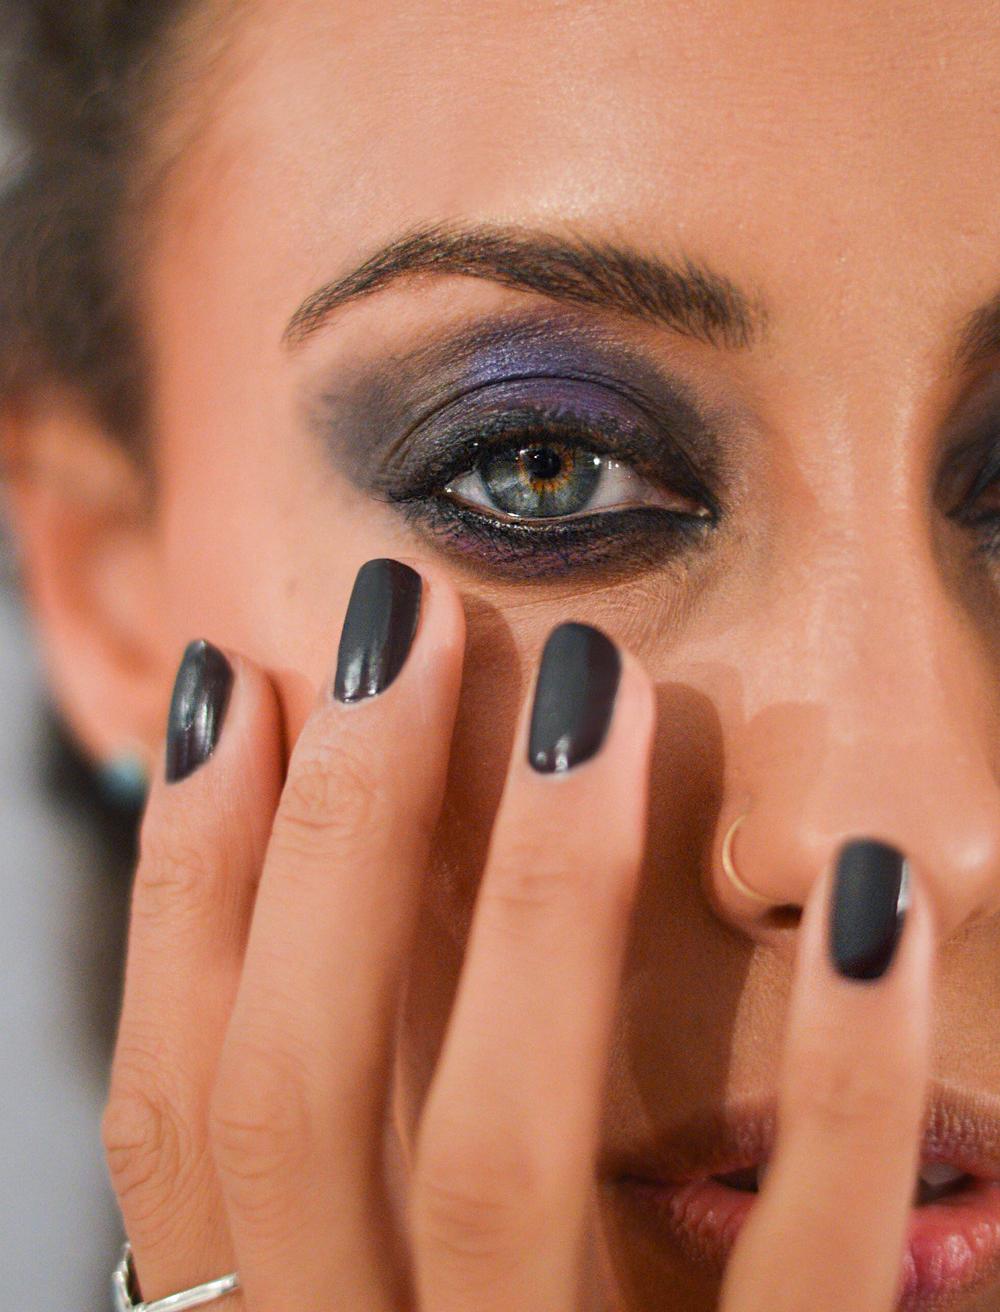 Atelier Kate x Deco Miami. Photo by Julianna Dahbura.